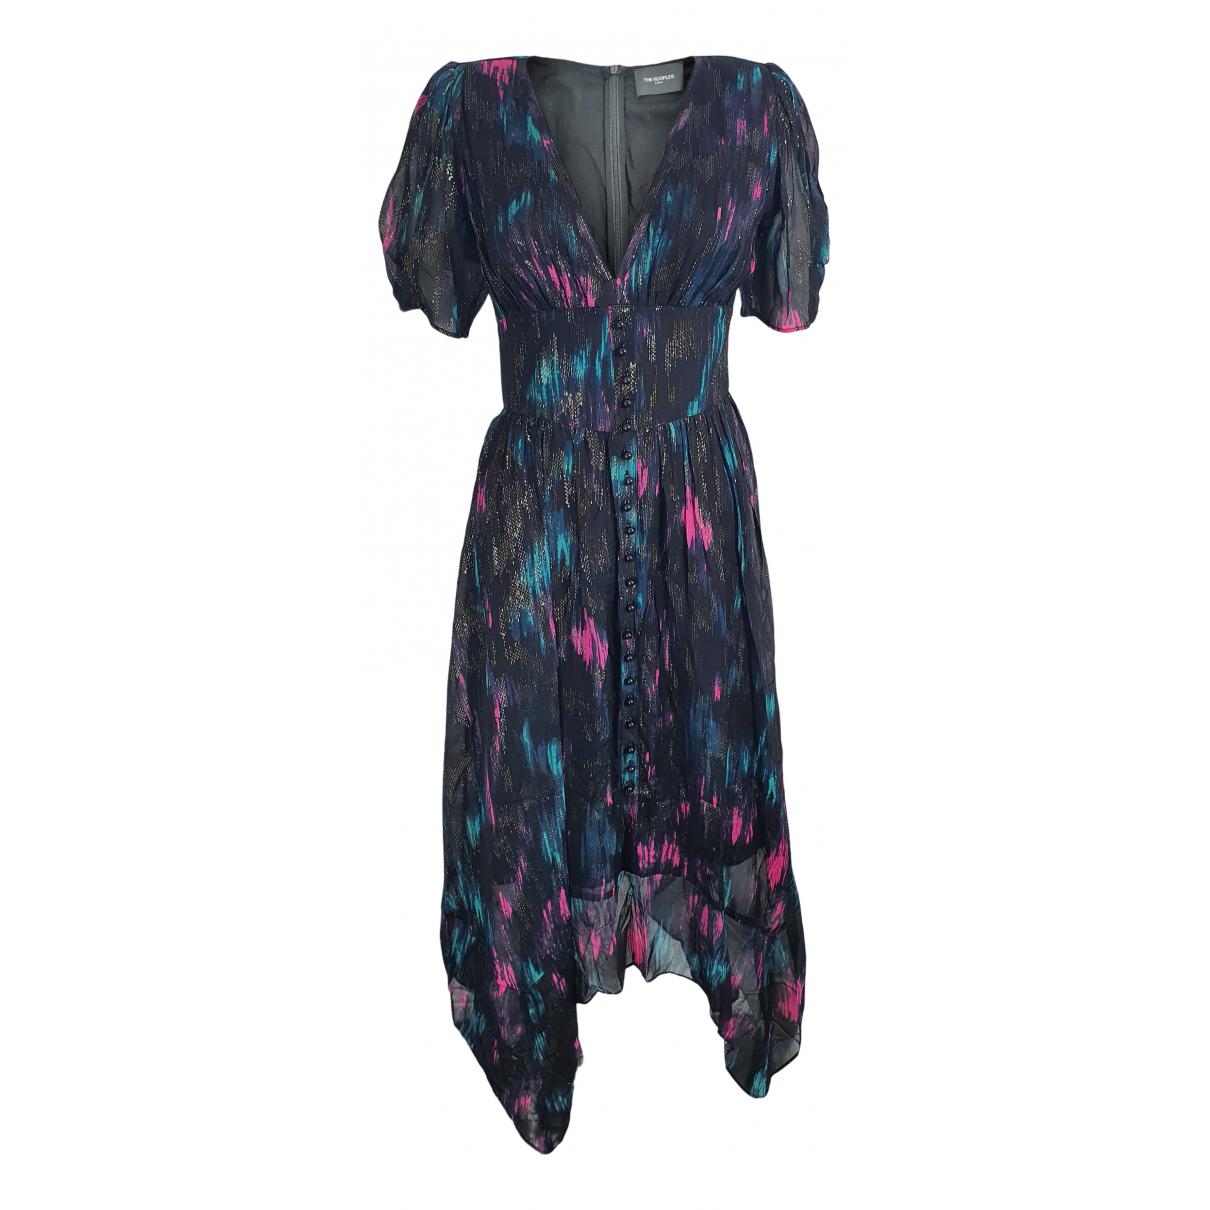 The Kooples Spring Summer 2020 Black dress for Women 1 0-5